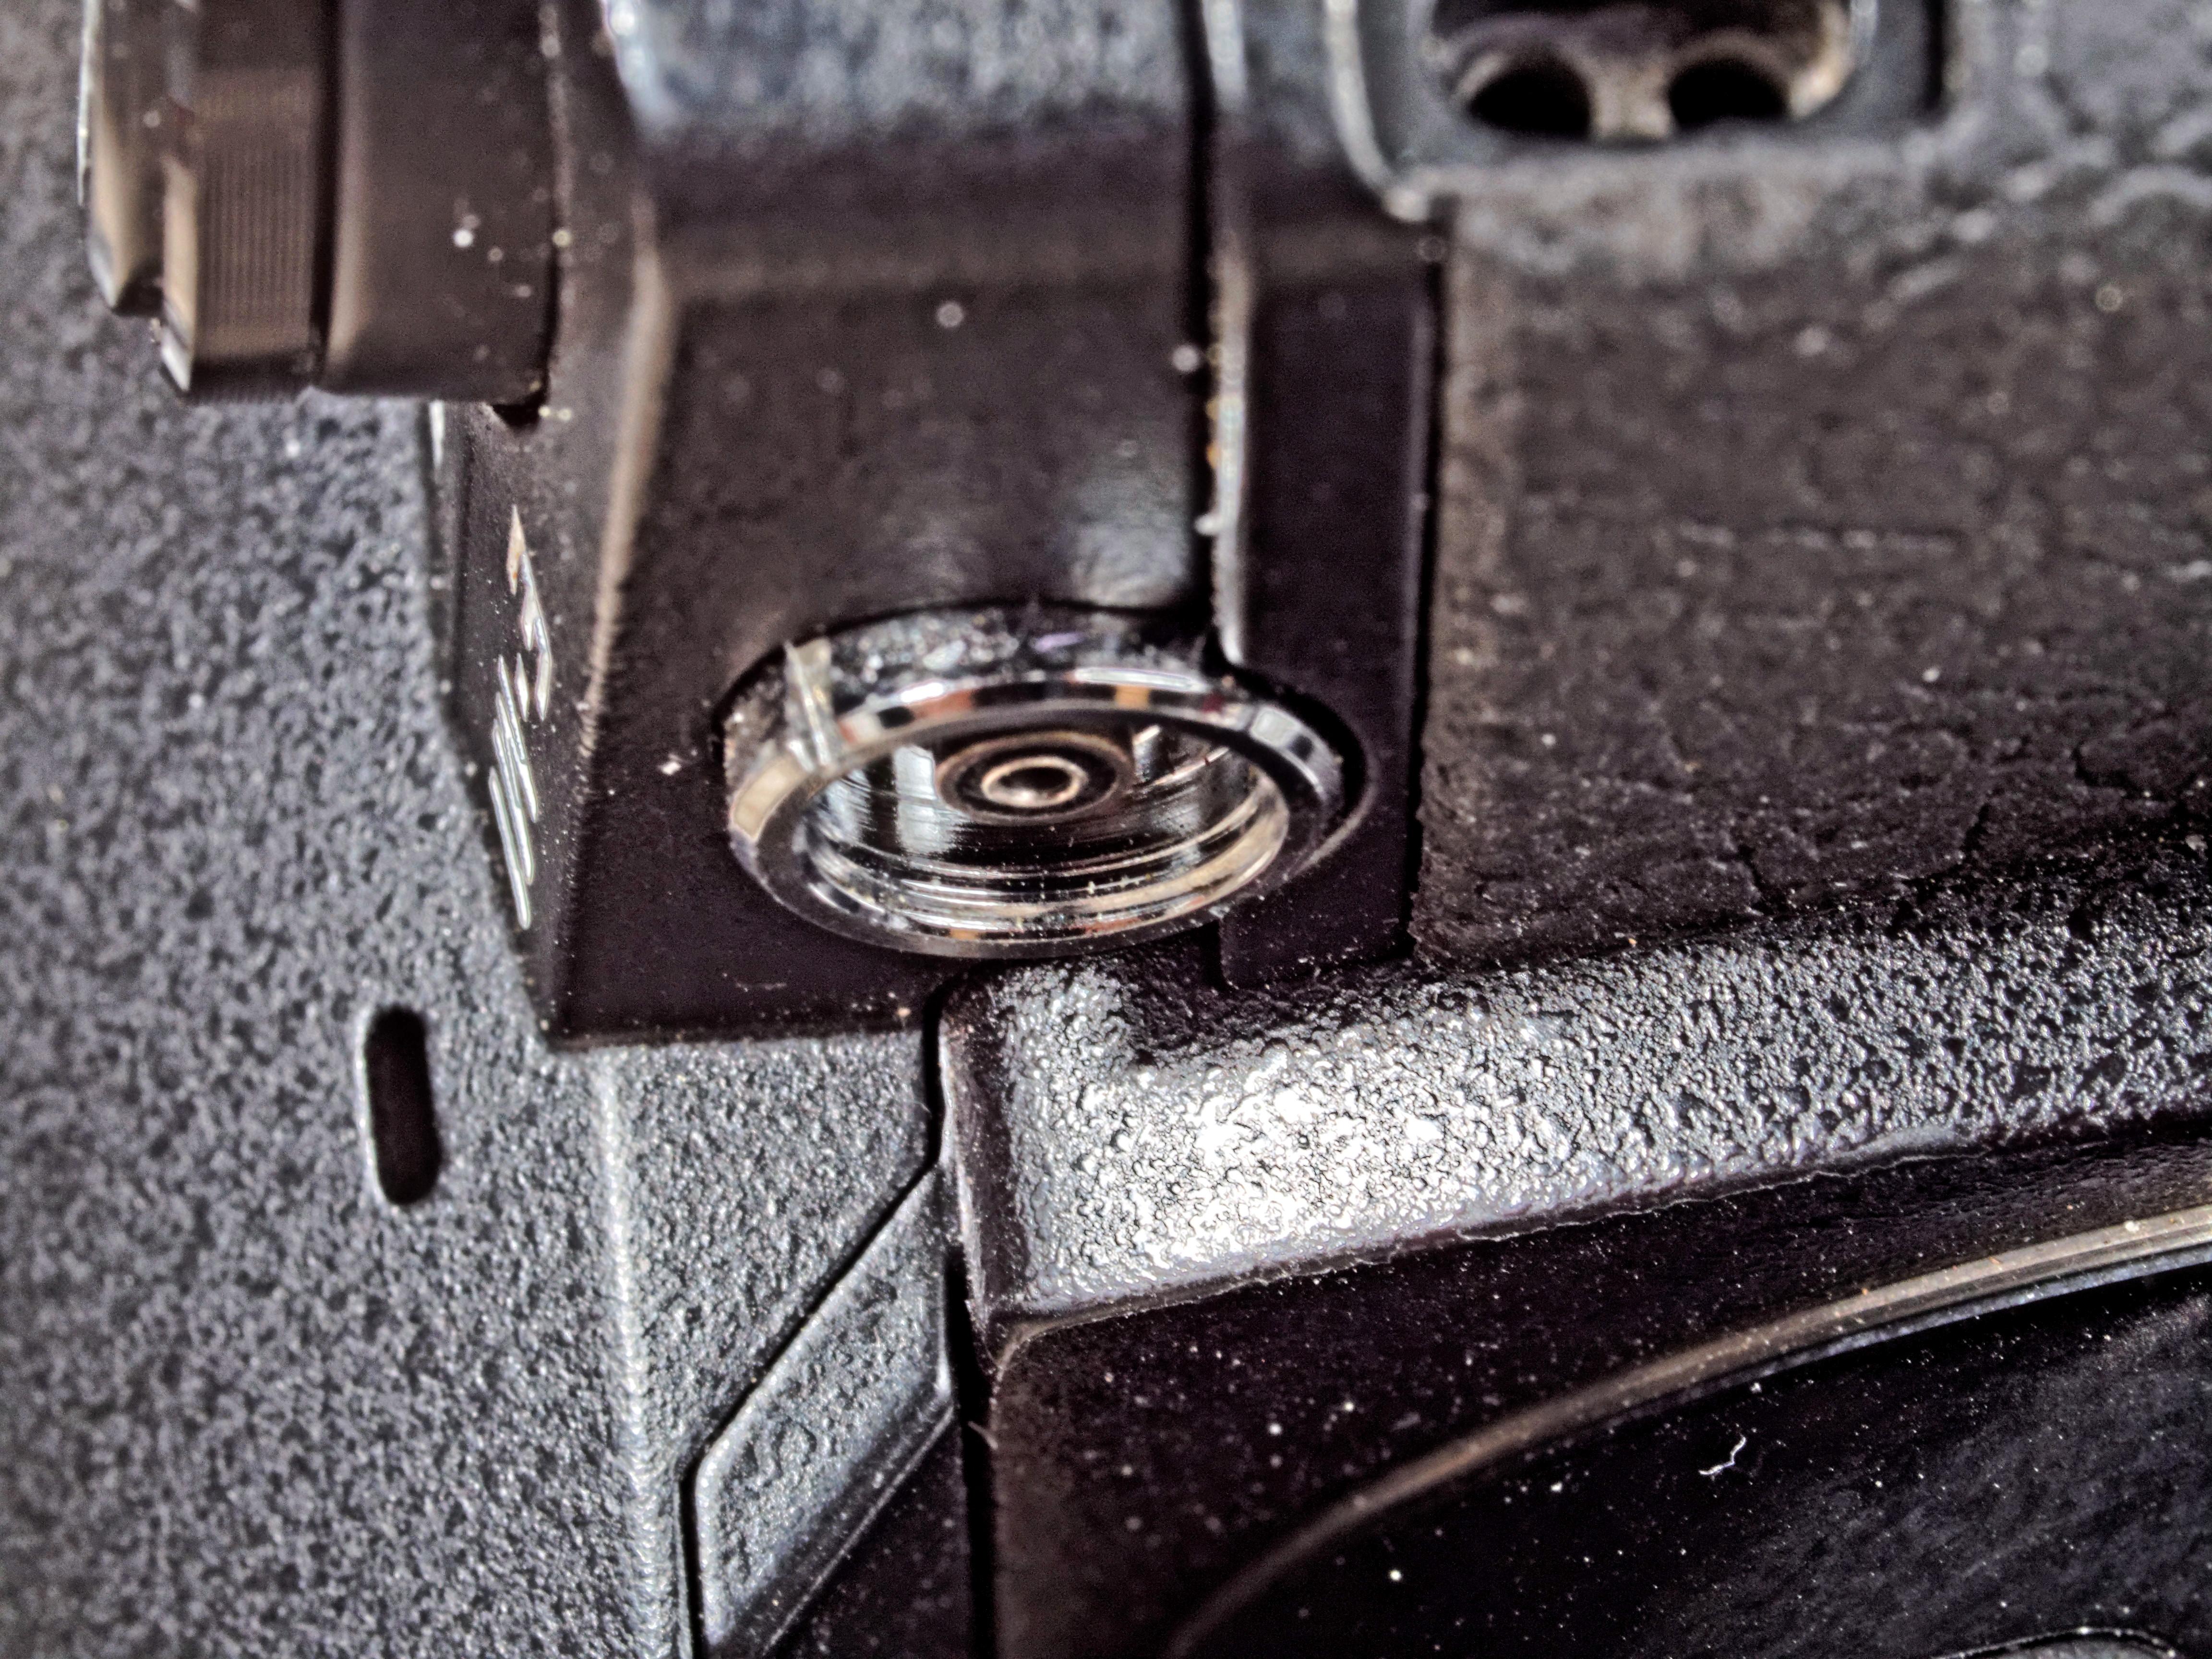 Damaged-camera-2.jpeg